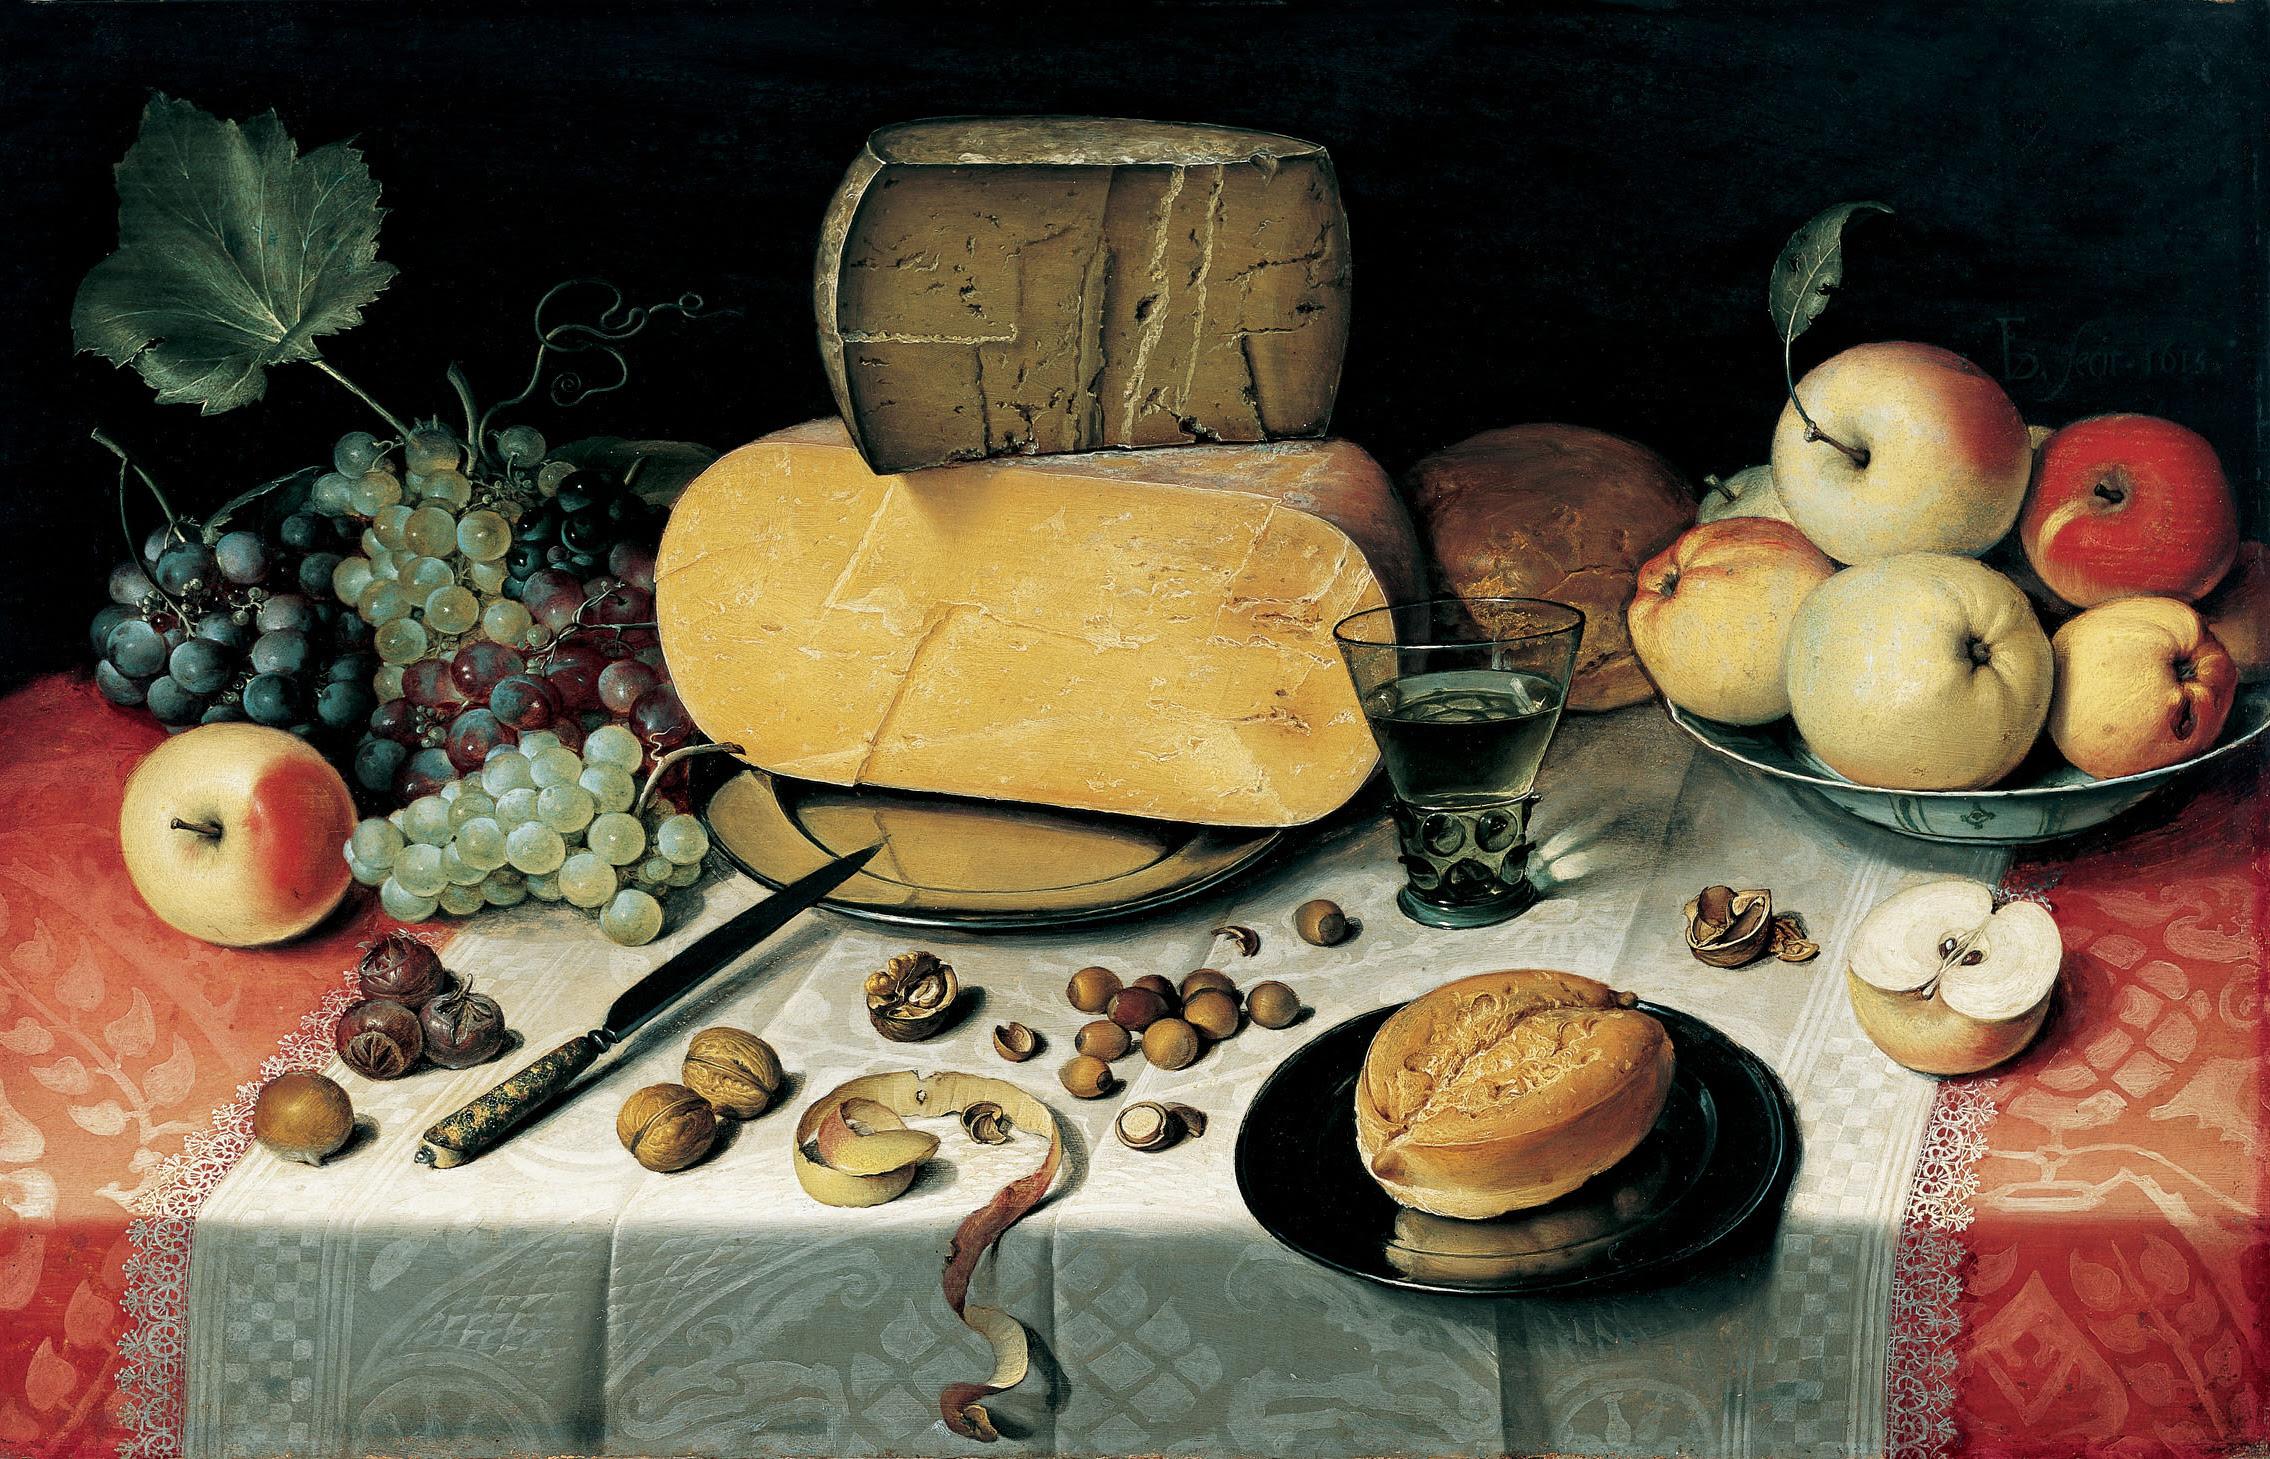 http://upload.wikimedia.org/wikipedia/commons/a/a4/Floris_Claesz._van_Dyck_001.jpg